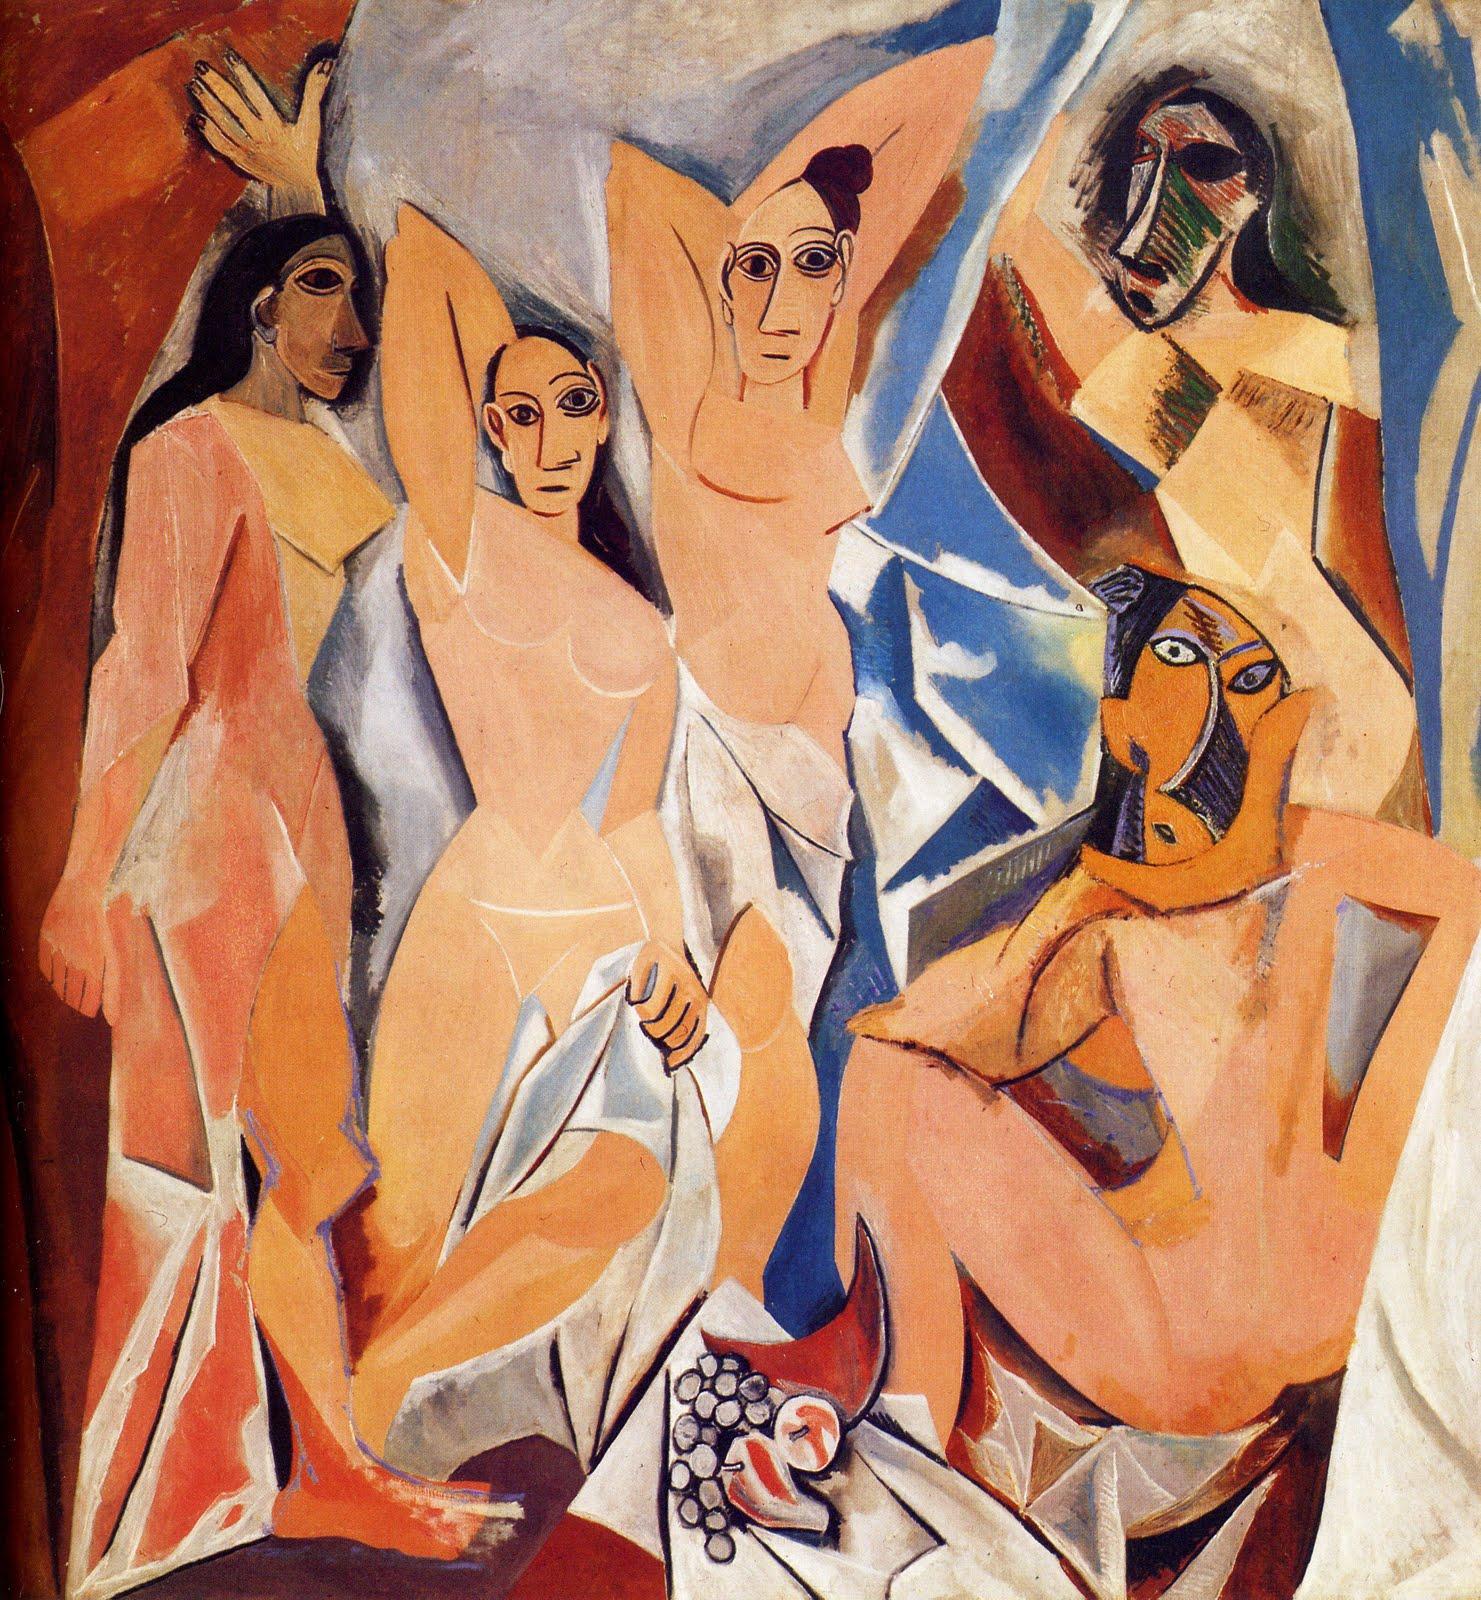 Les Demoiselles d'Avignon (The Young Ladies of Avignon) Originally titled: The Brothel of Avignon Pablo Picasso (1881 – 1973) Museum of Modern Art, New York Oil on Canvas (243.9cm x 233.7cm) 1907